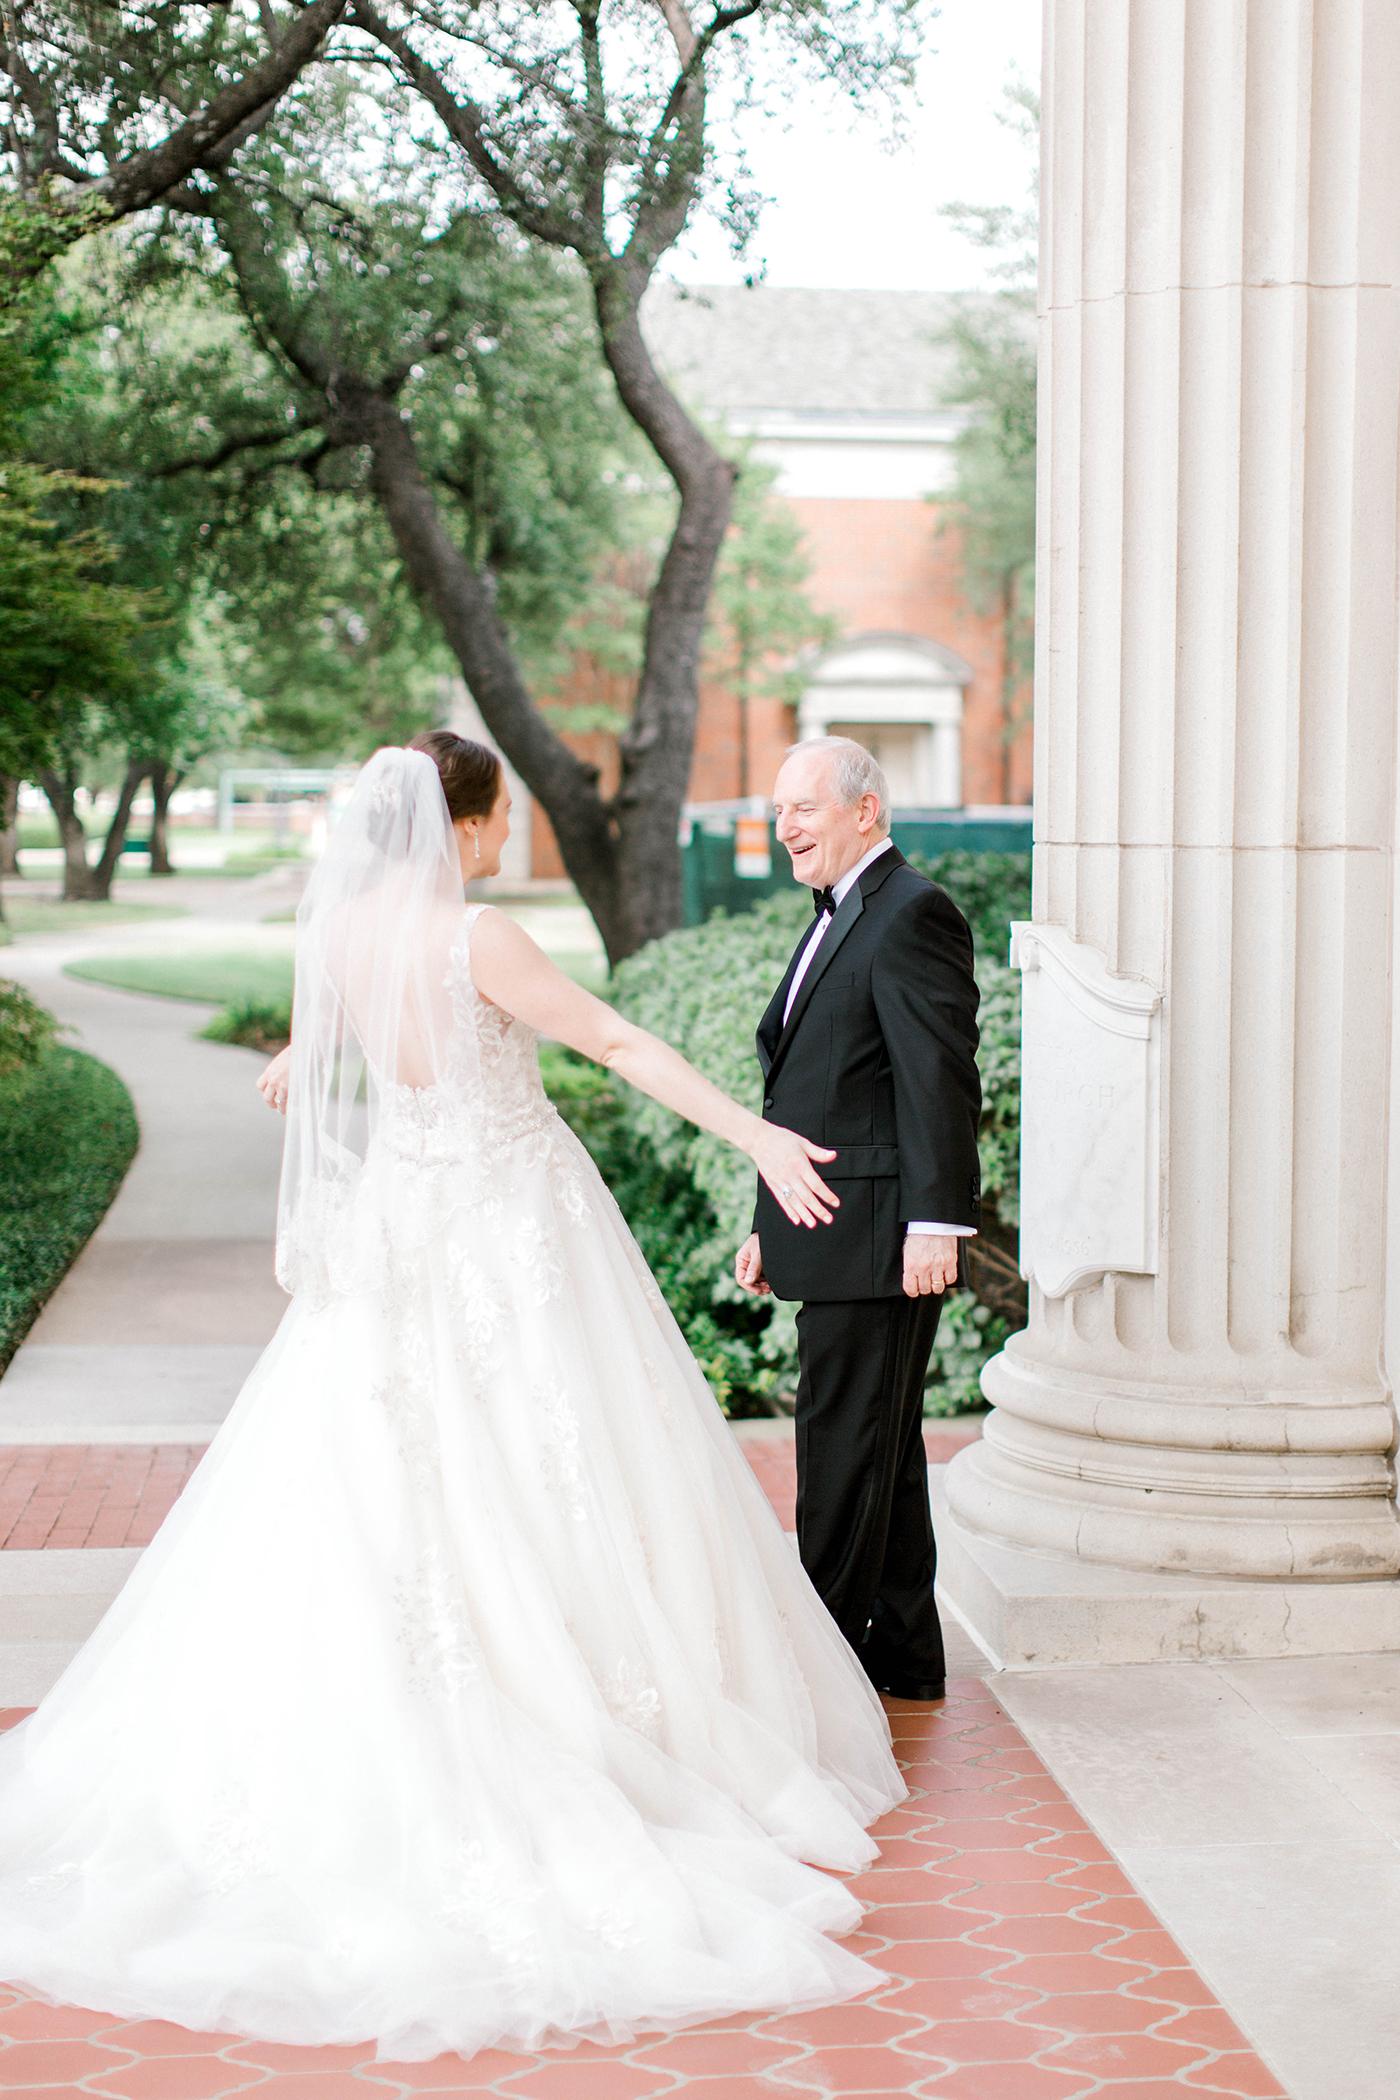 Dallas TX Wedding Planner - Allday Events - Hall on Dragon Wedding - 00005.jpg